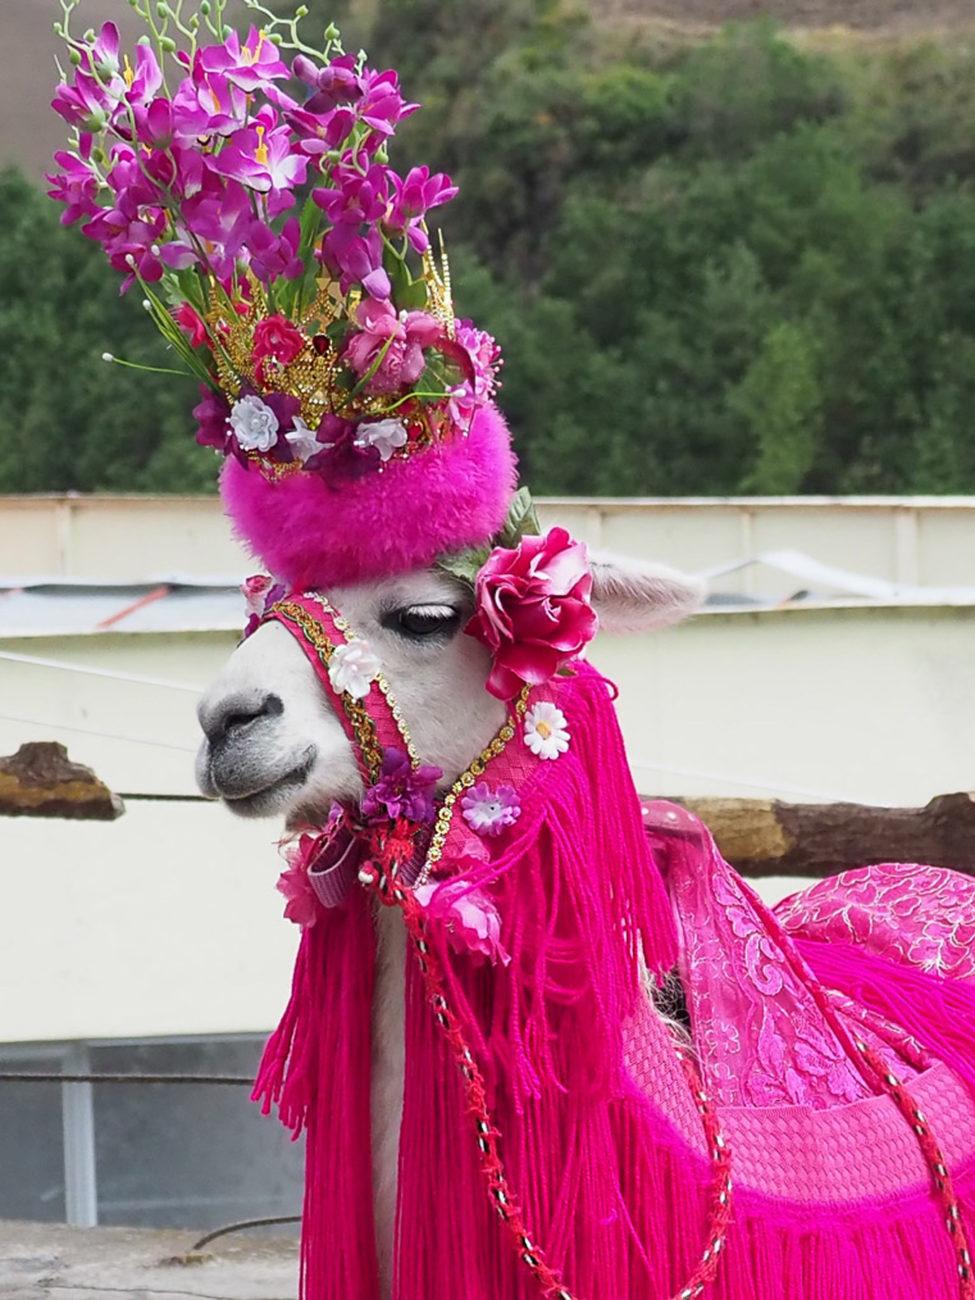 Mein erstes Lama! – in etwas grellem Outfit